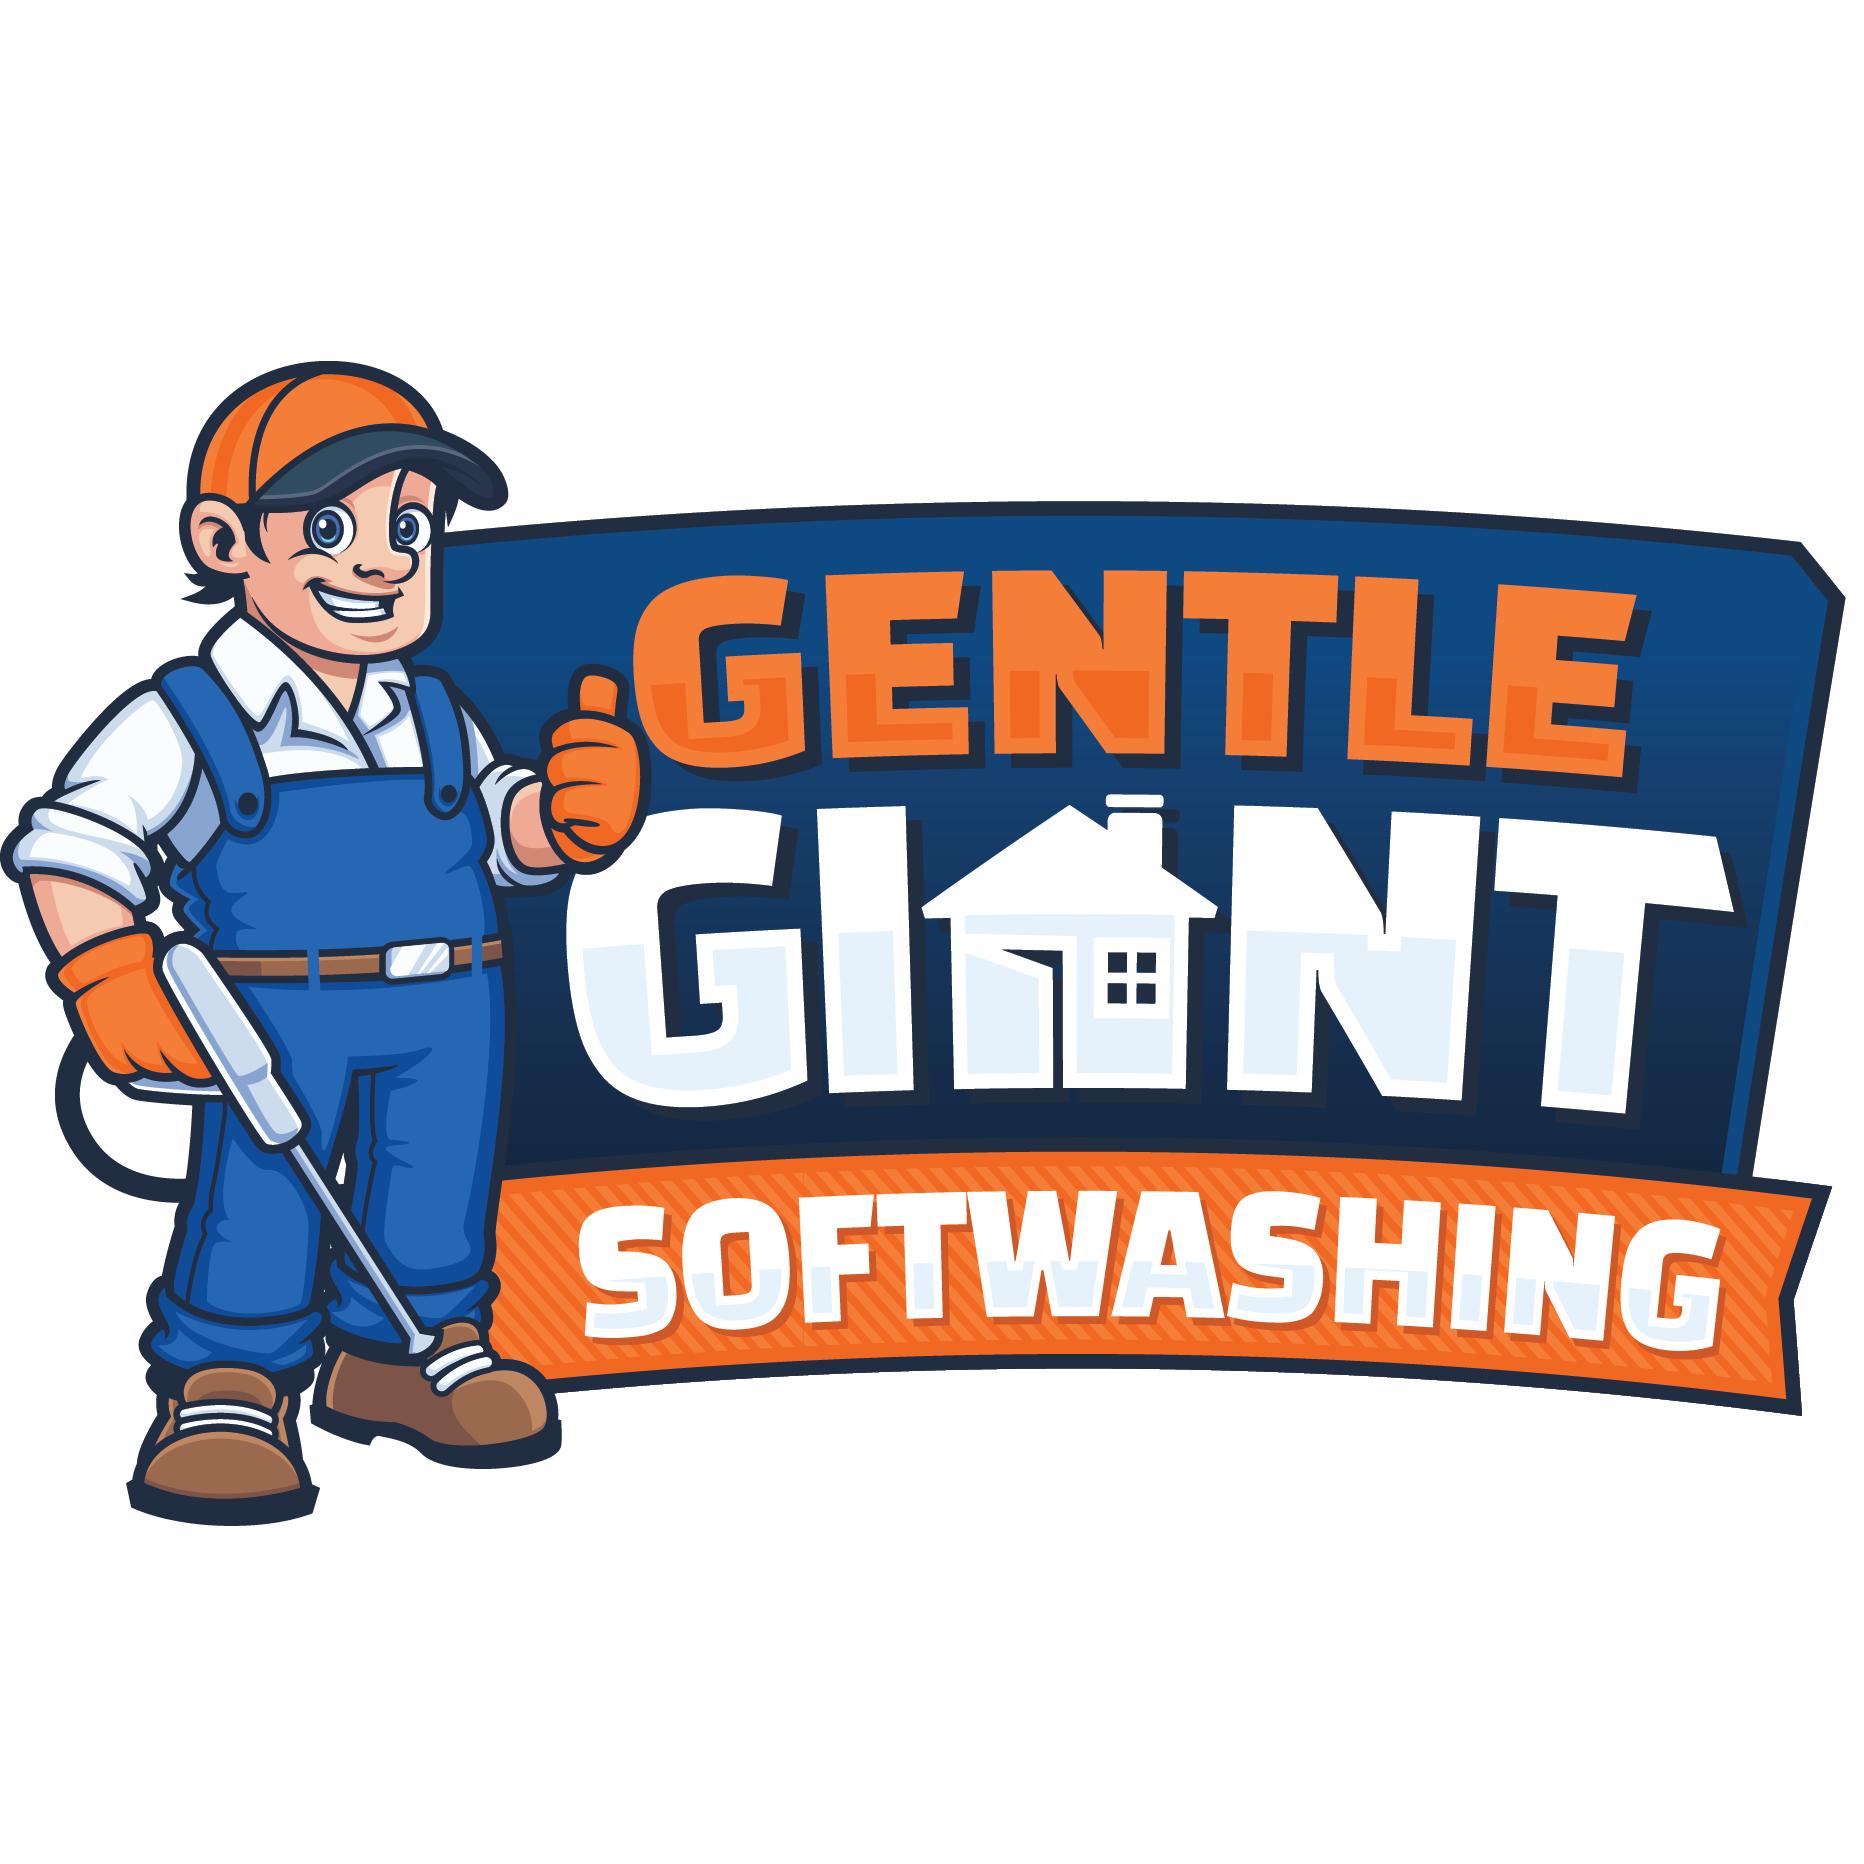 Gentle Giant Softwashing